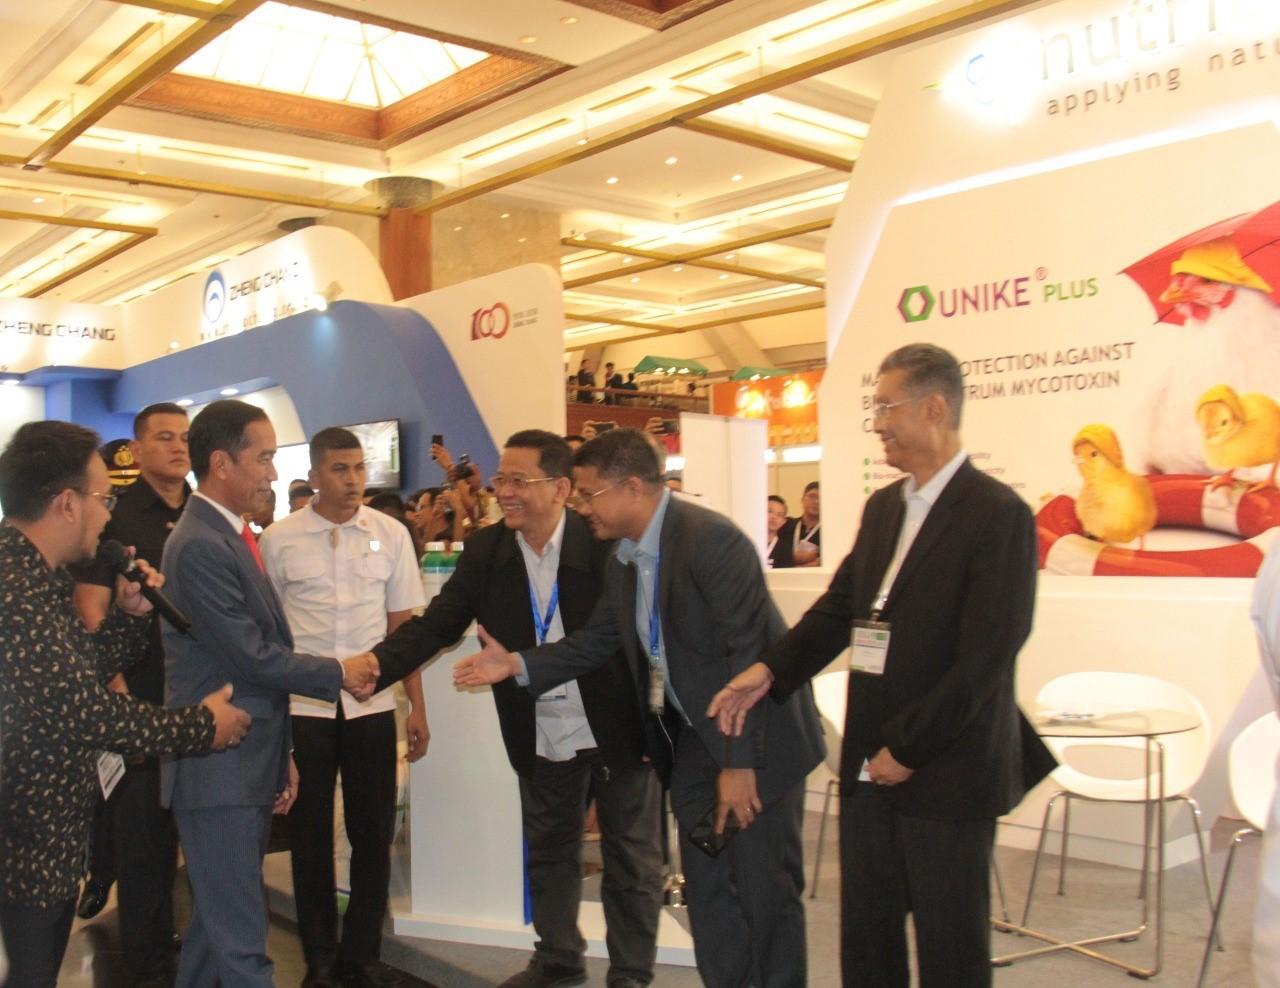 NUTRIAD DRAWS PRESIDENTIAL INTEREST AT INDO LIVESTOCK